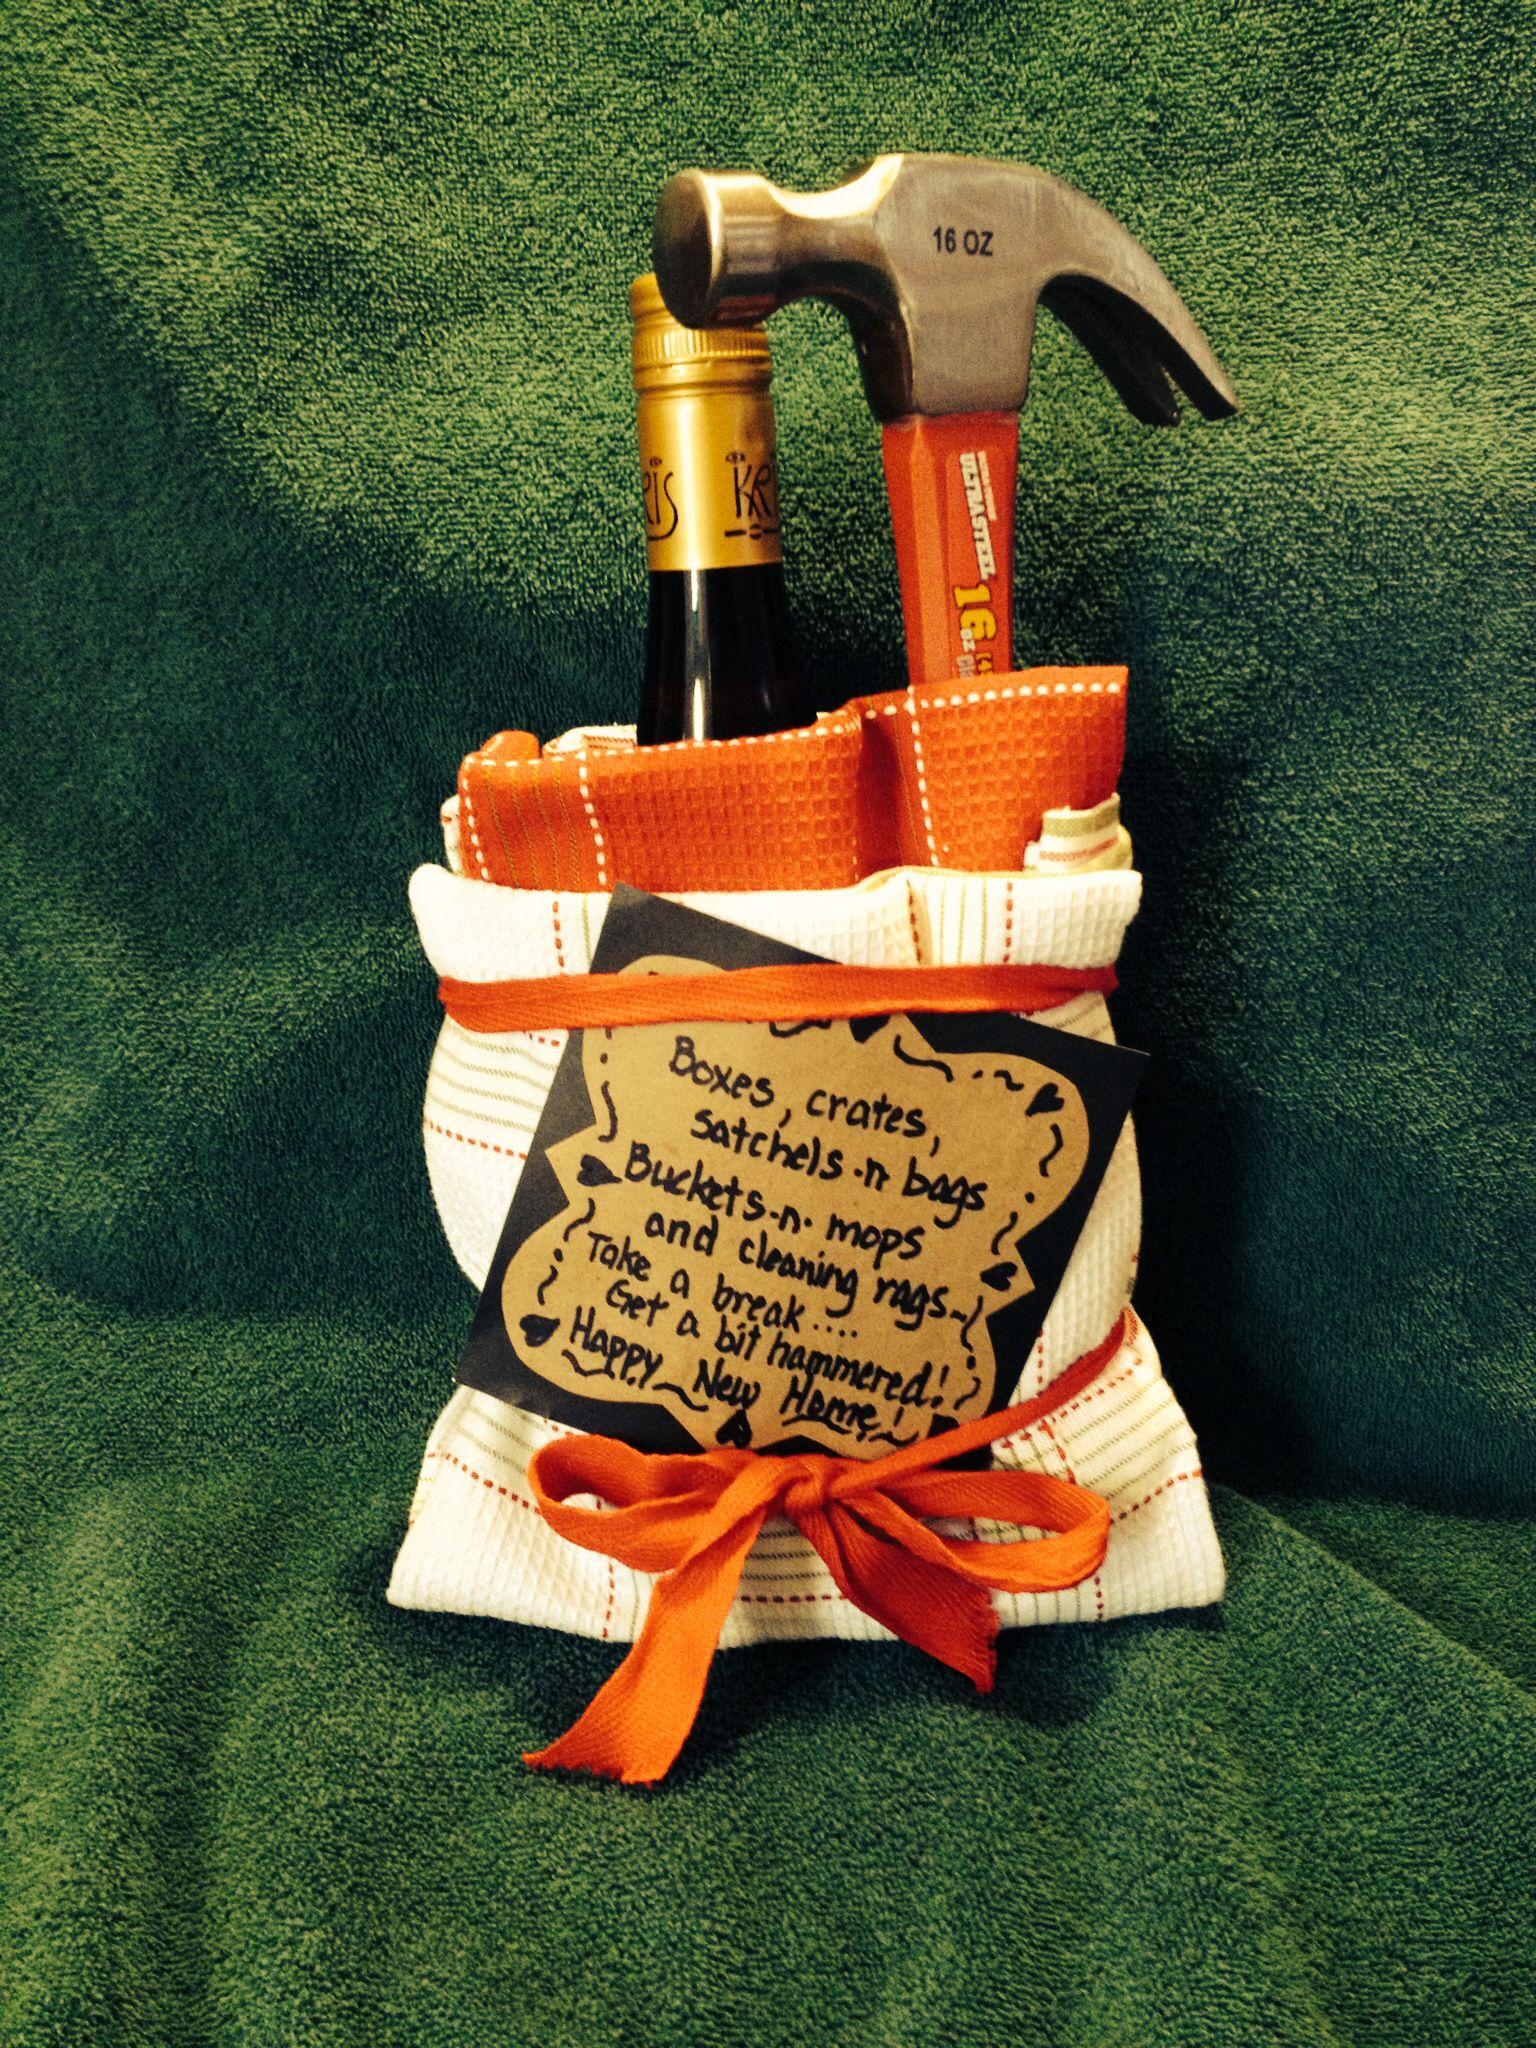 Housewarming gift ideas pinterest - Return gifts for housewarming party ...